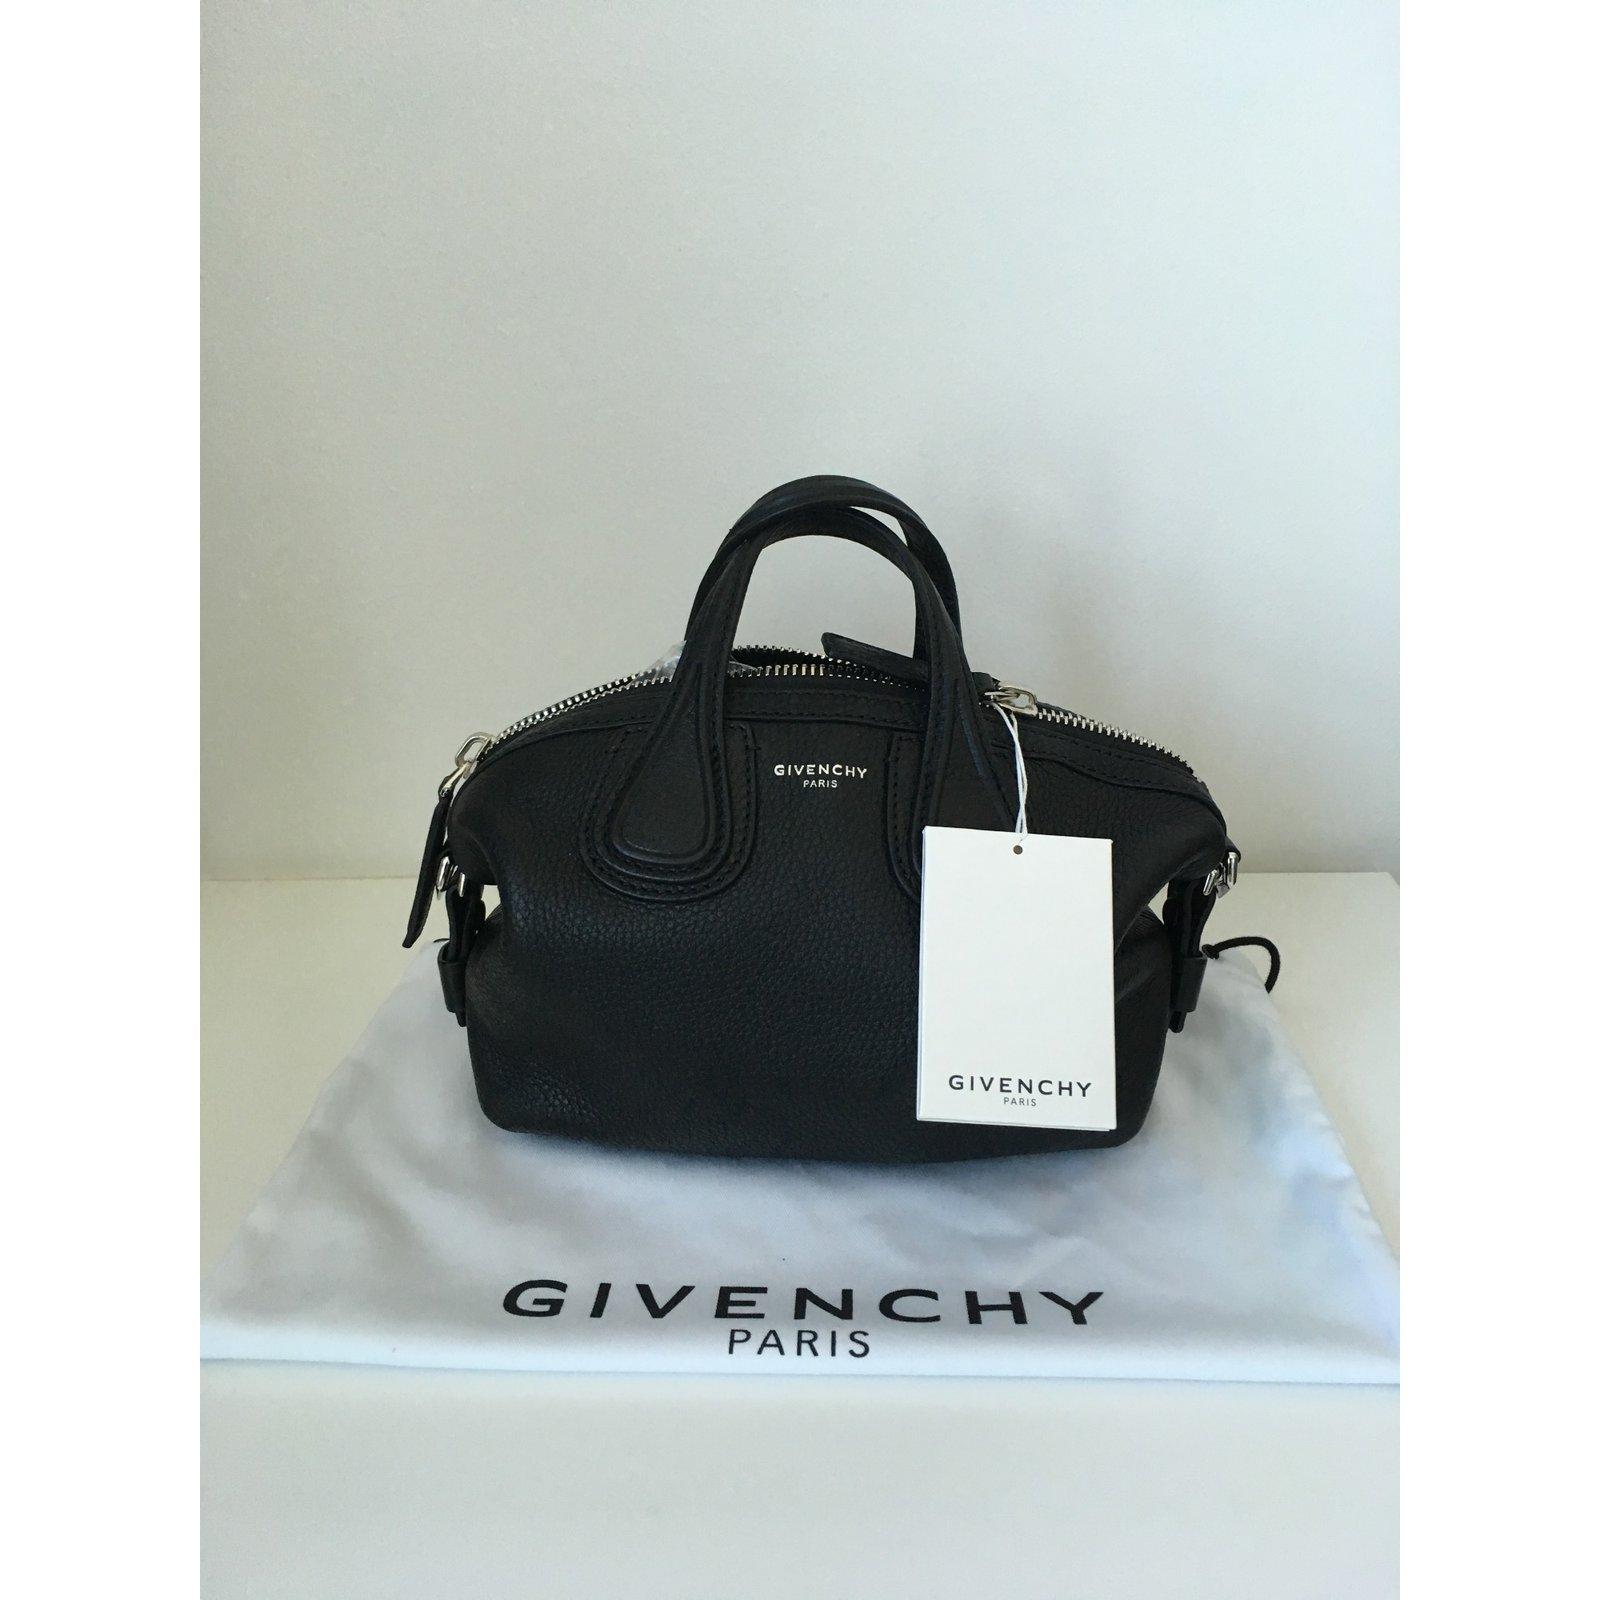 68772c9795 Givenchy Nightingale Mini Bag Handbags Leather Black ref.76067 - Joli Closet